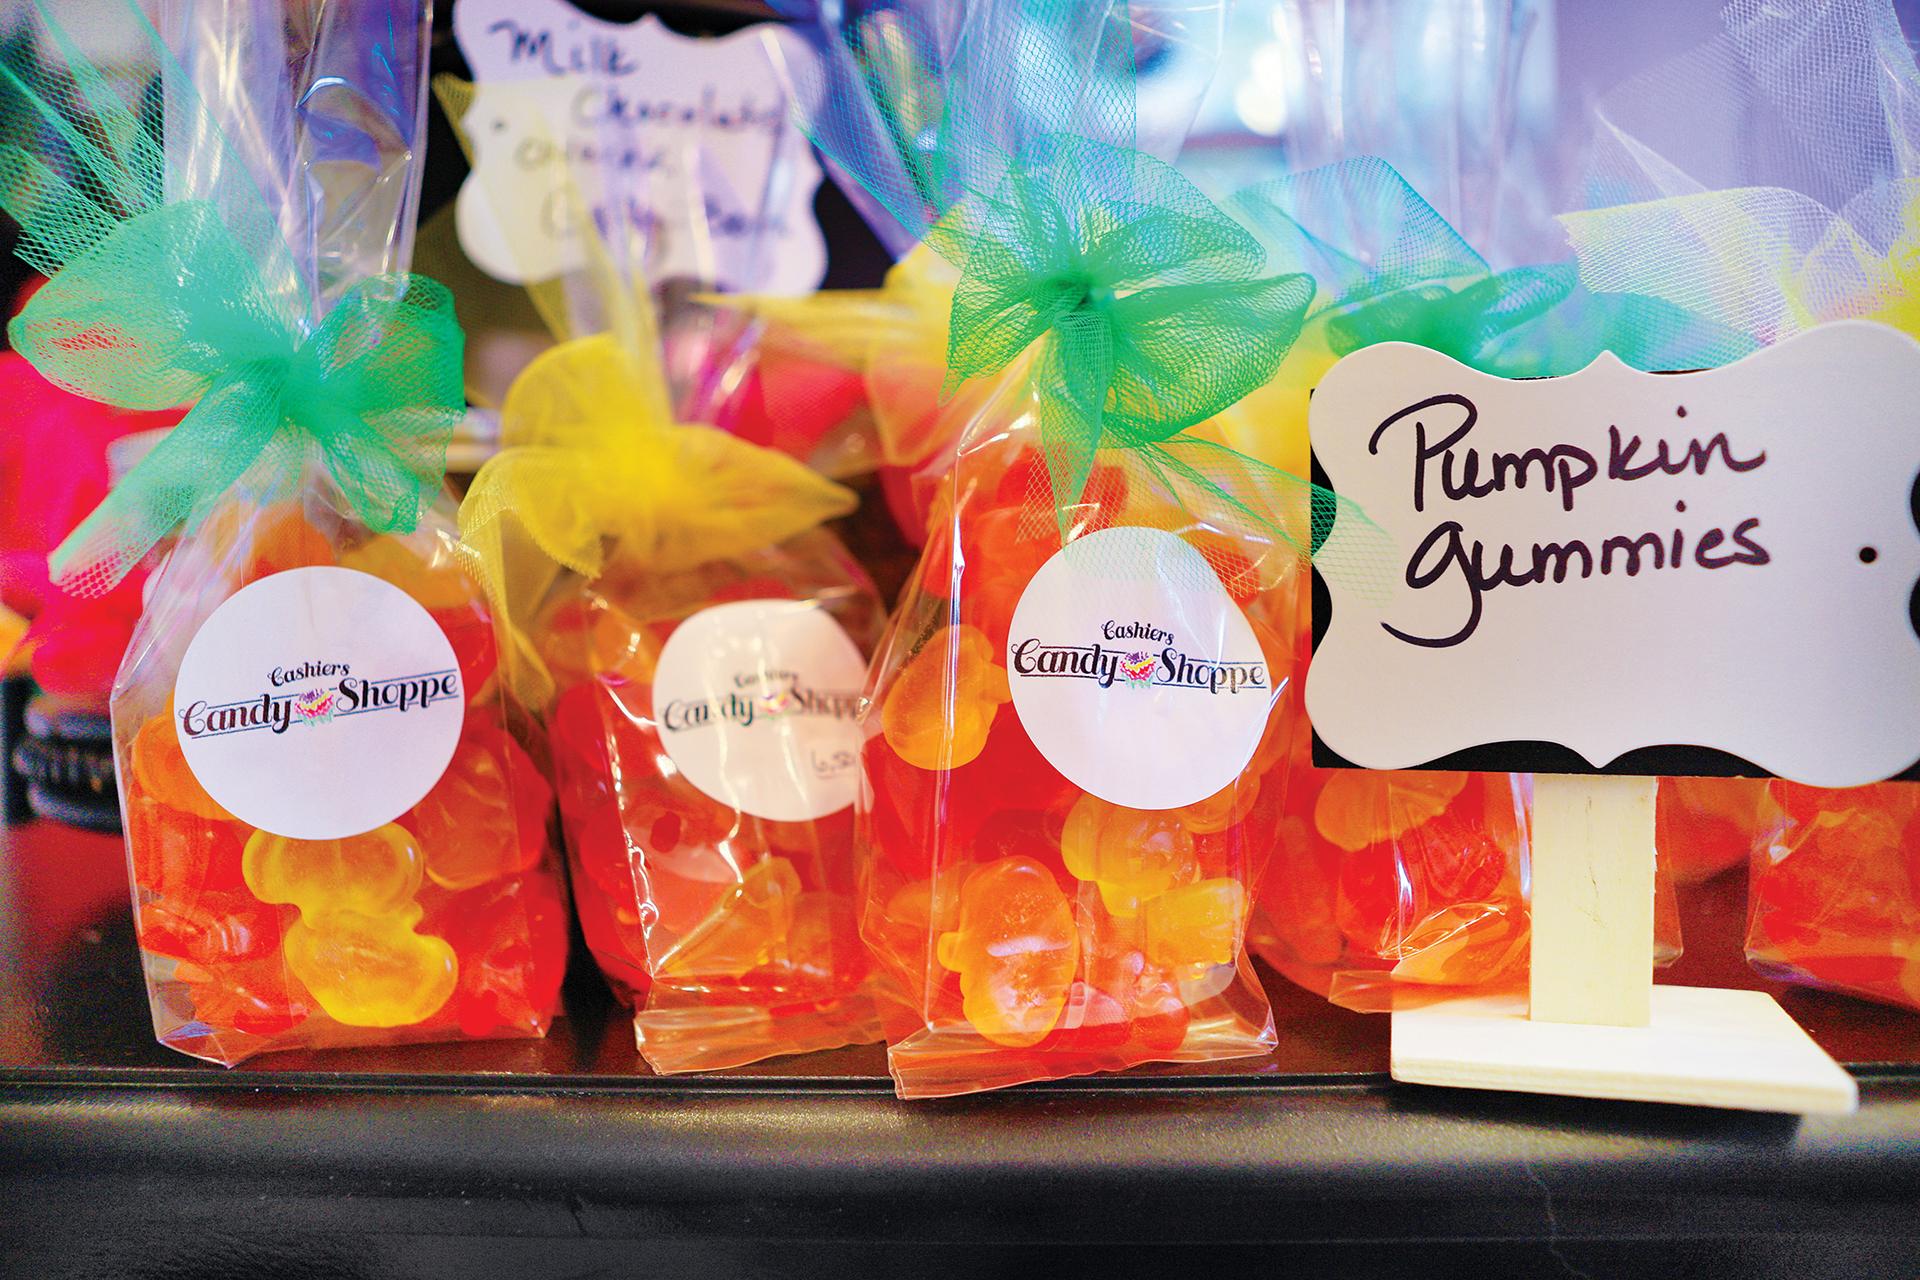 cashiers-nc-shopping-candy-shoppe-pumpkin-gummies